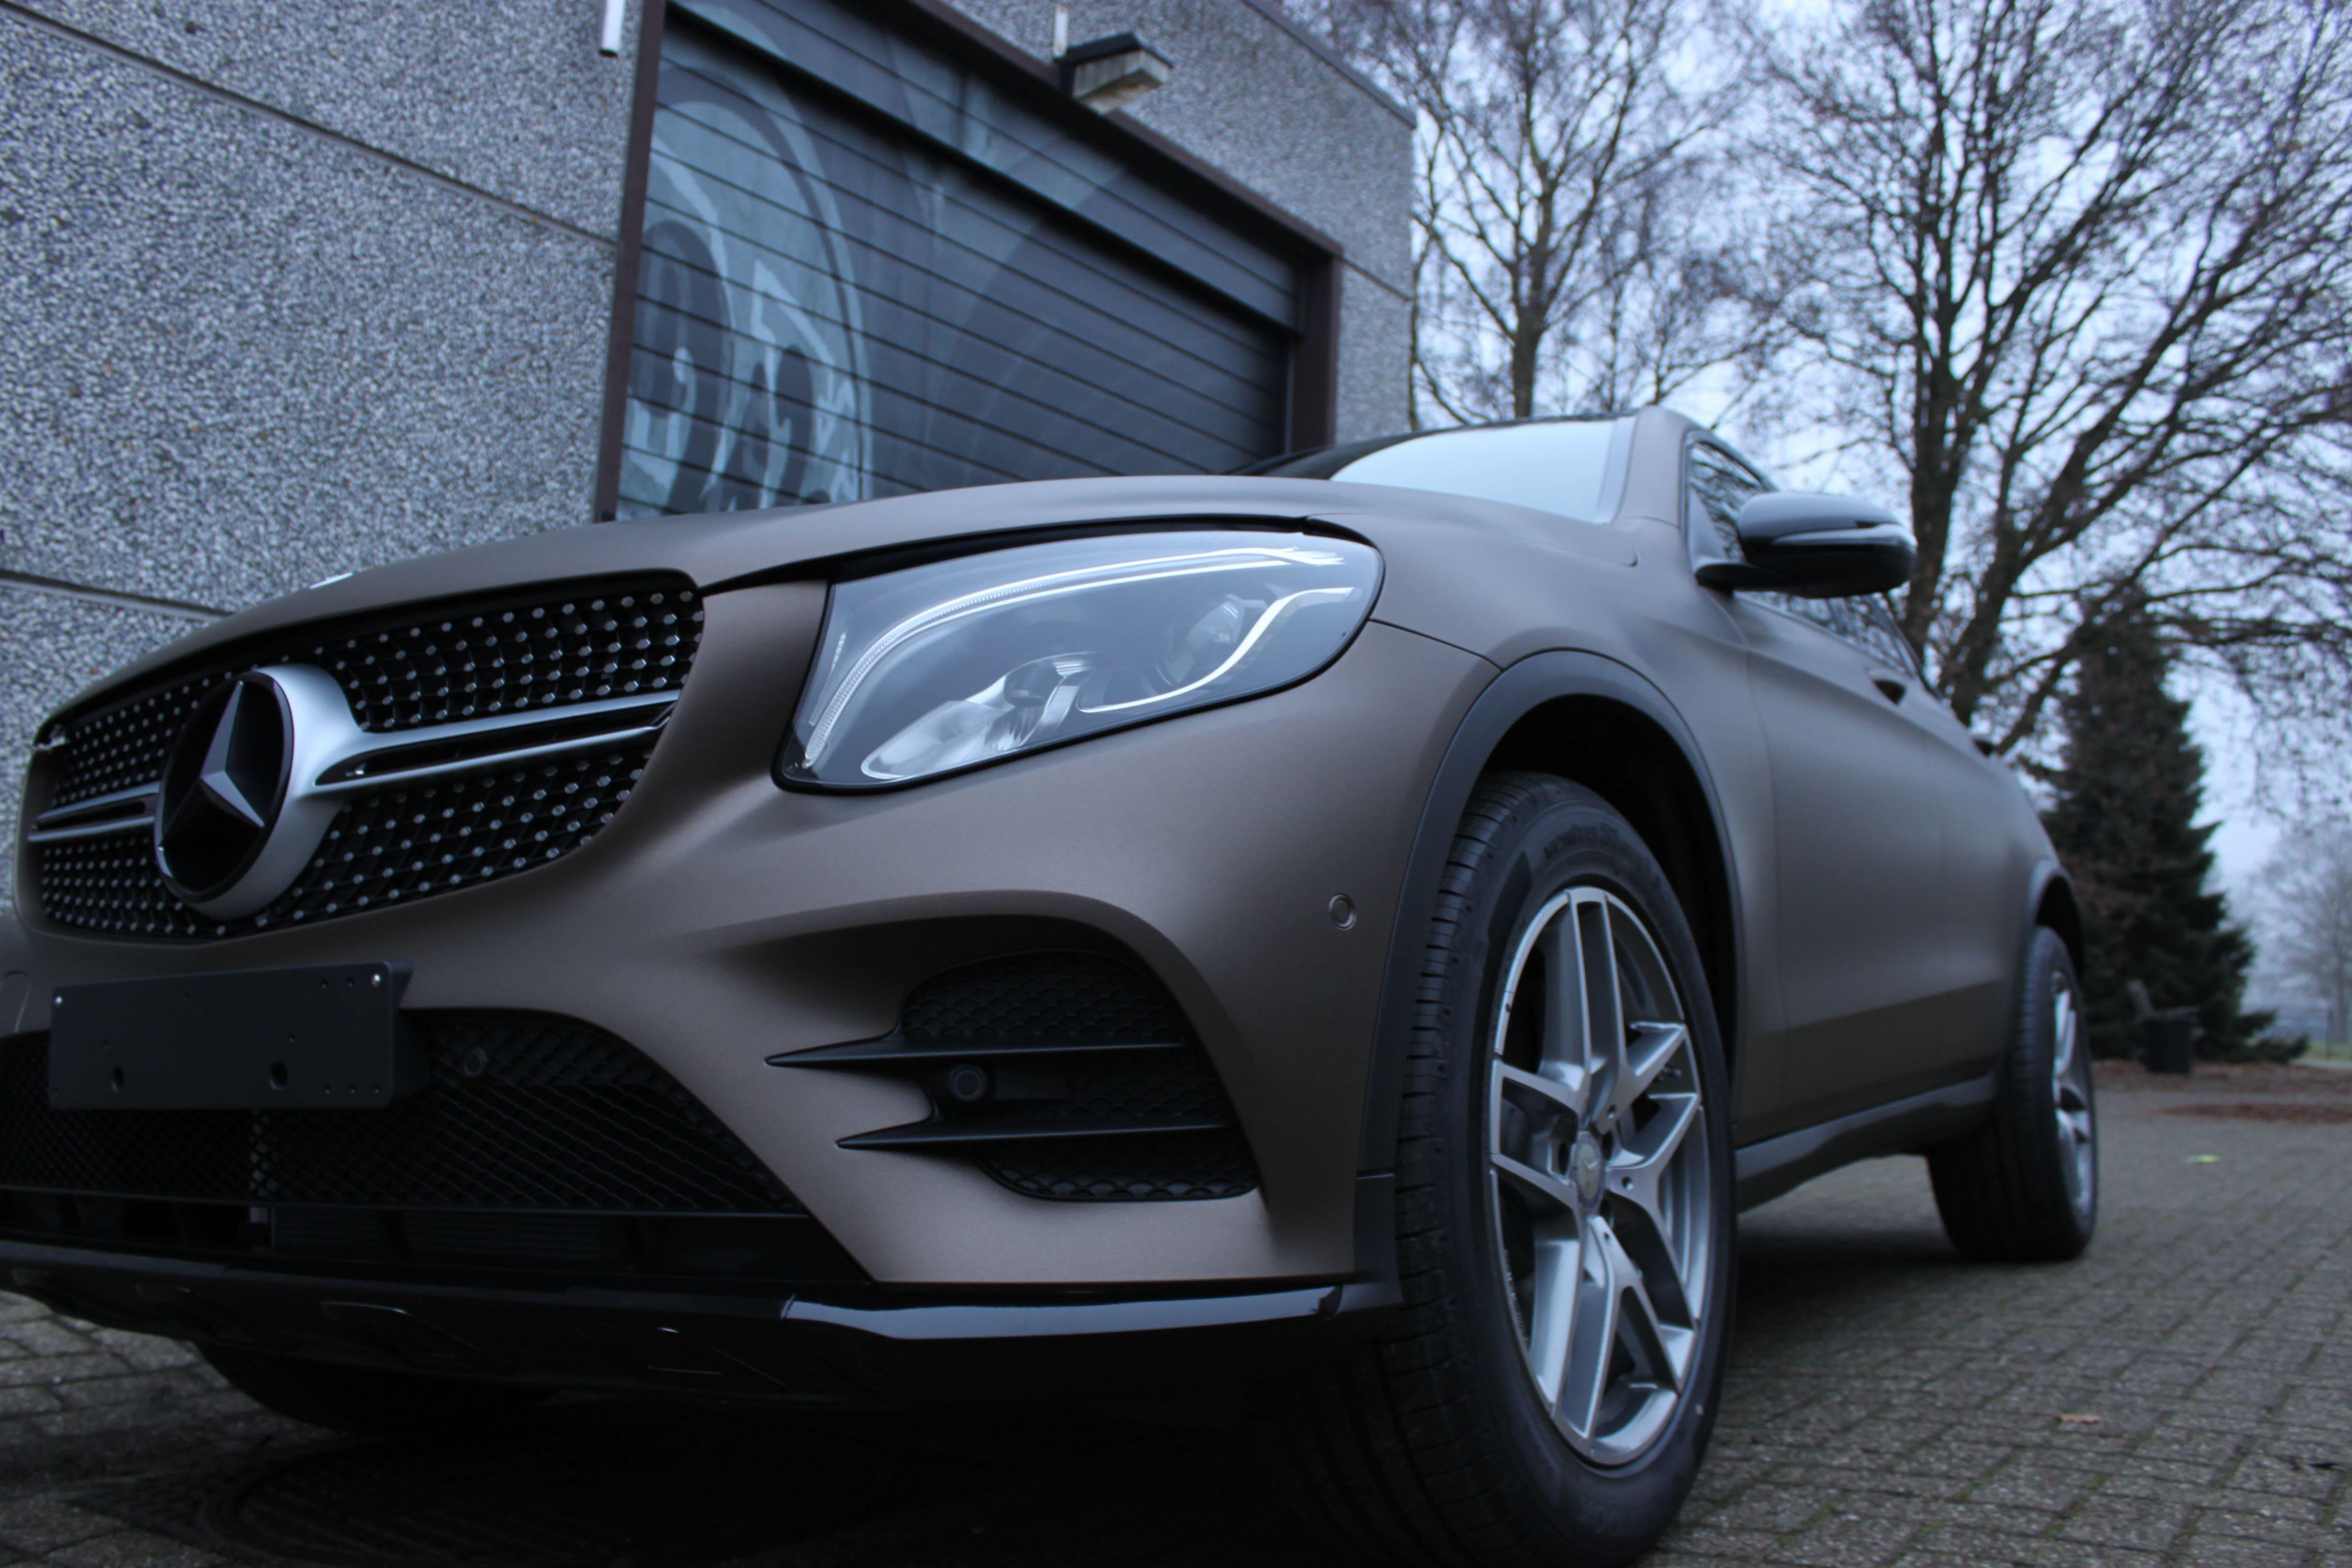 Mercedes GLC Coupe Matte metallic brown, Carwrapping door Wrapmyride.nu Foto-nr:9360, ©2021